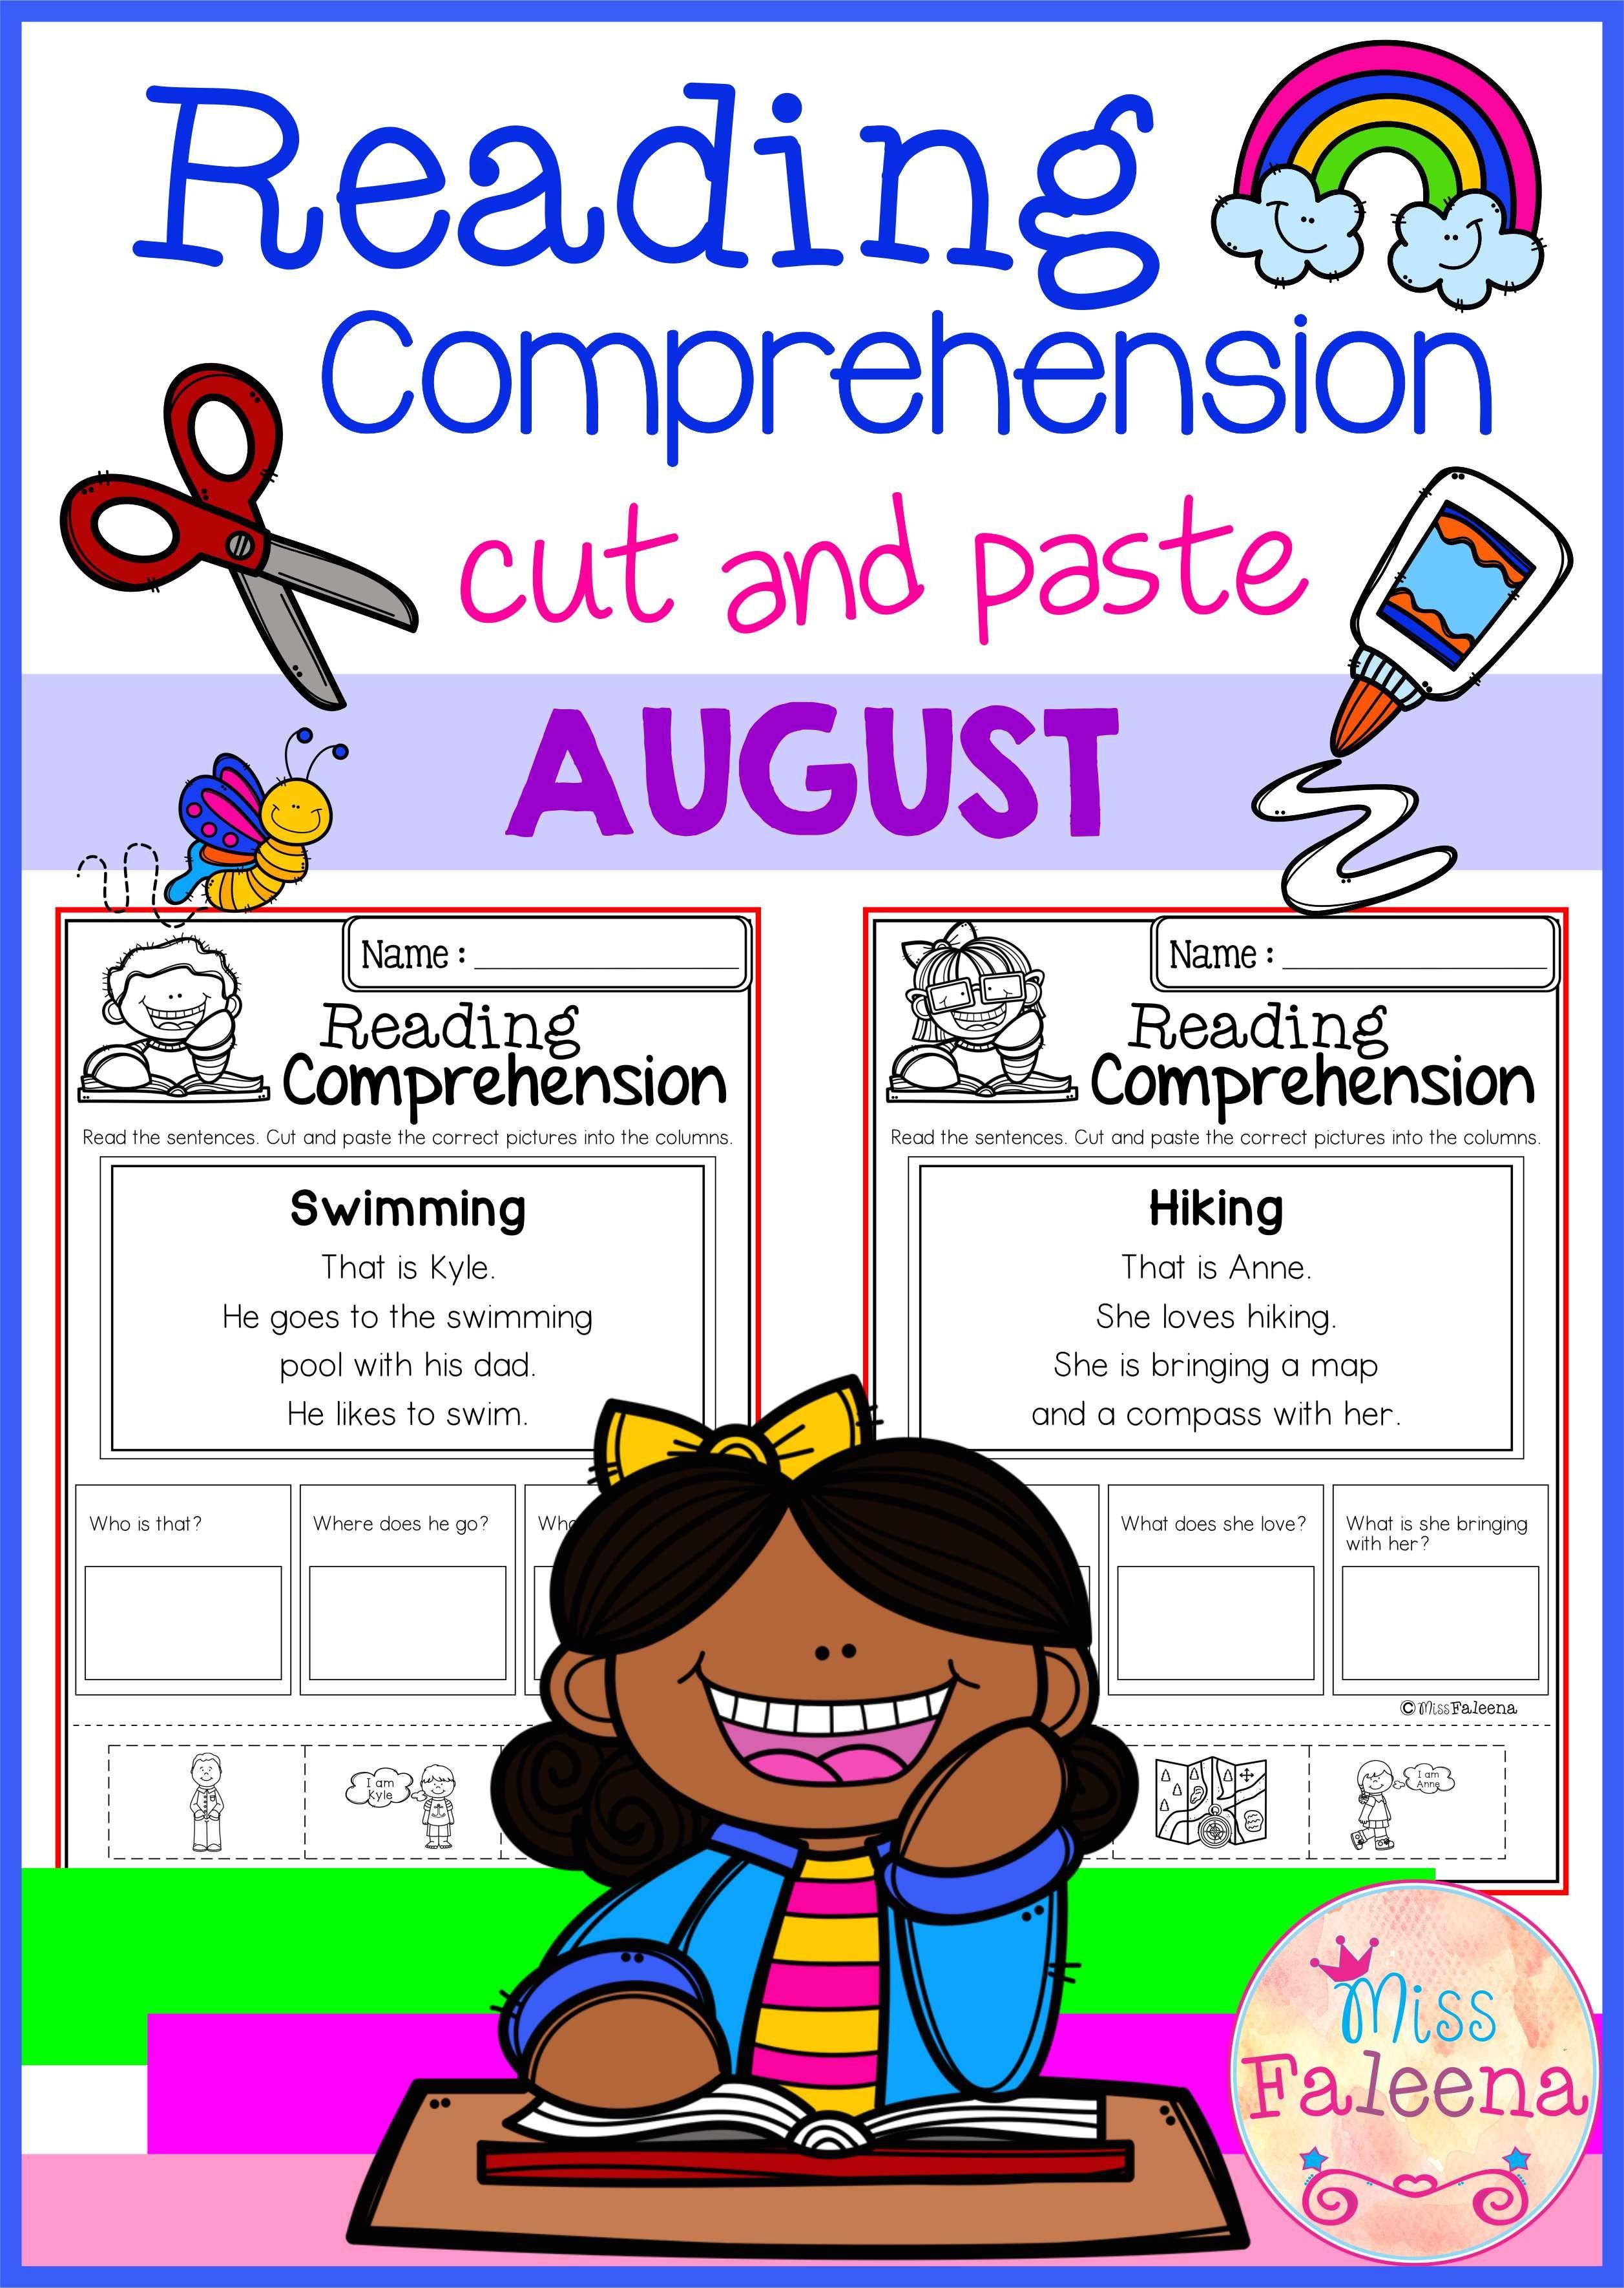 Reading Comprehension Worksheet For Special Needs